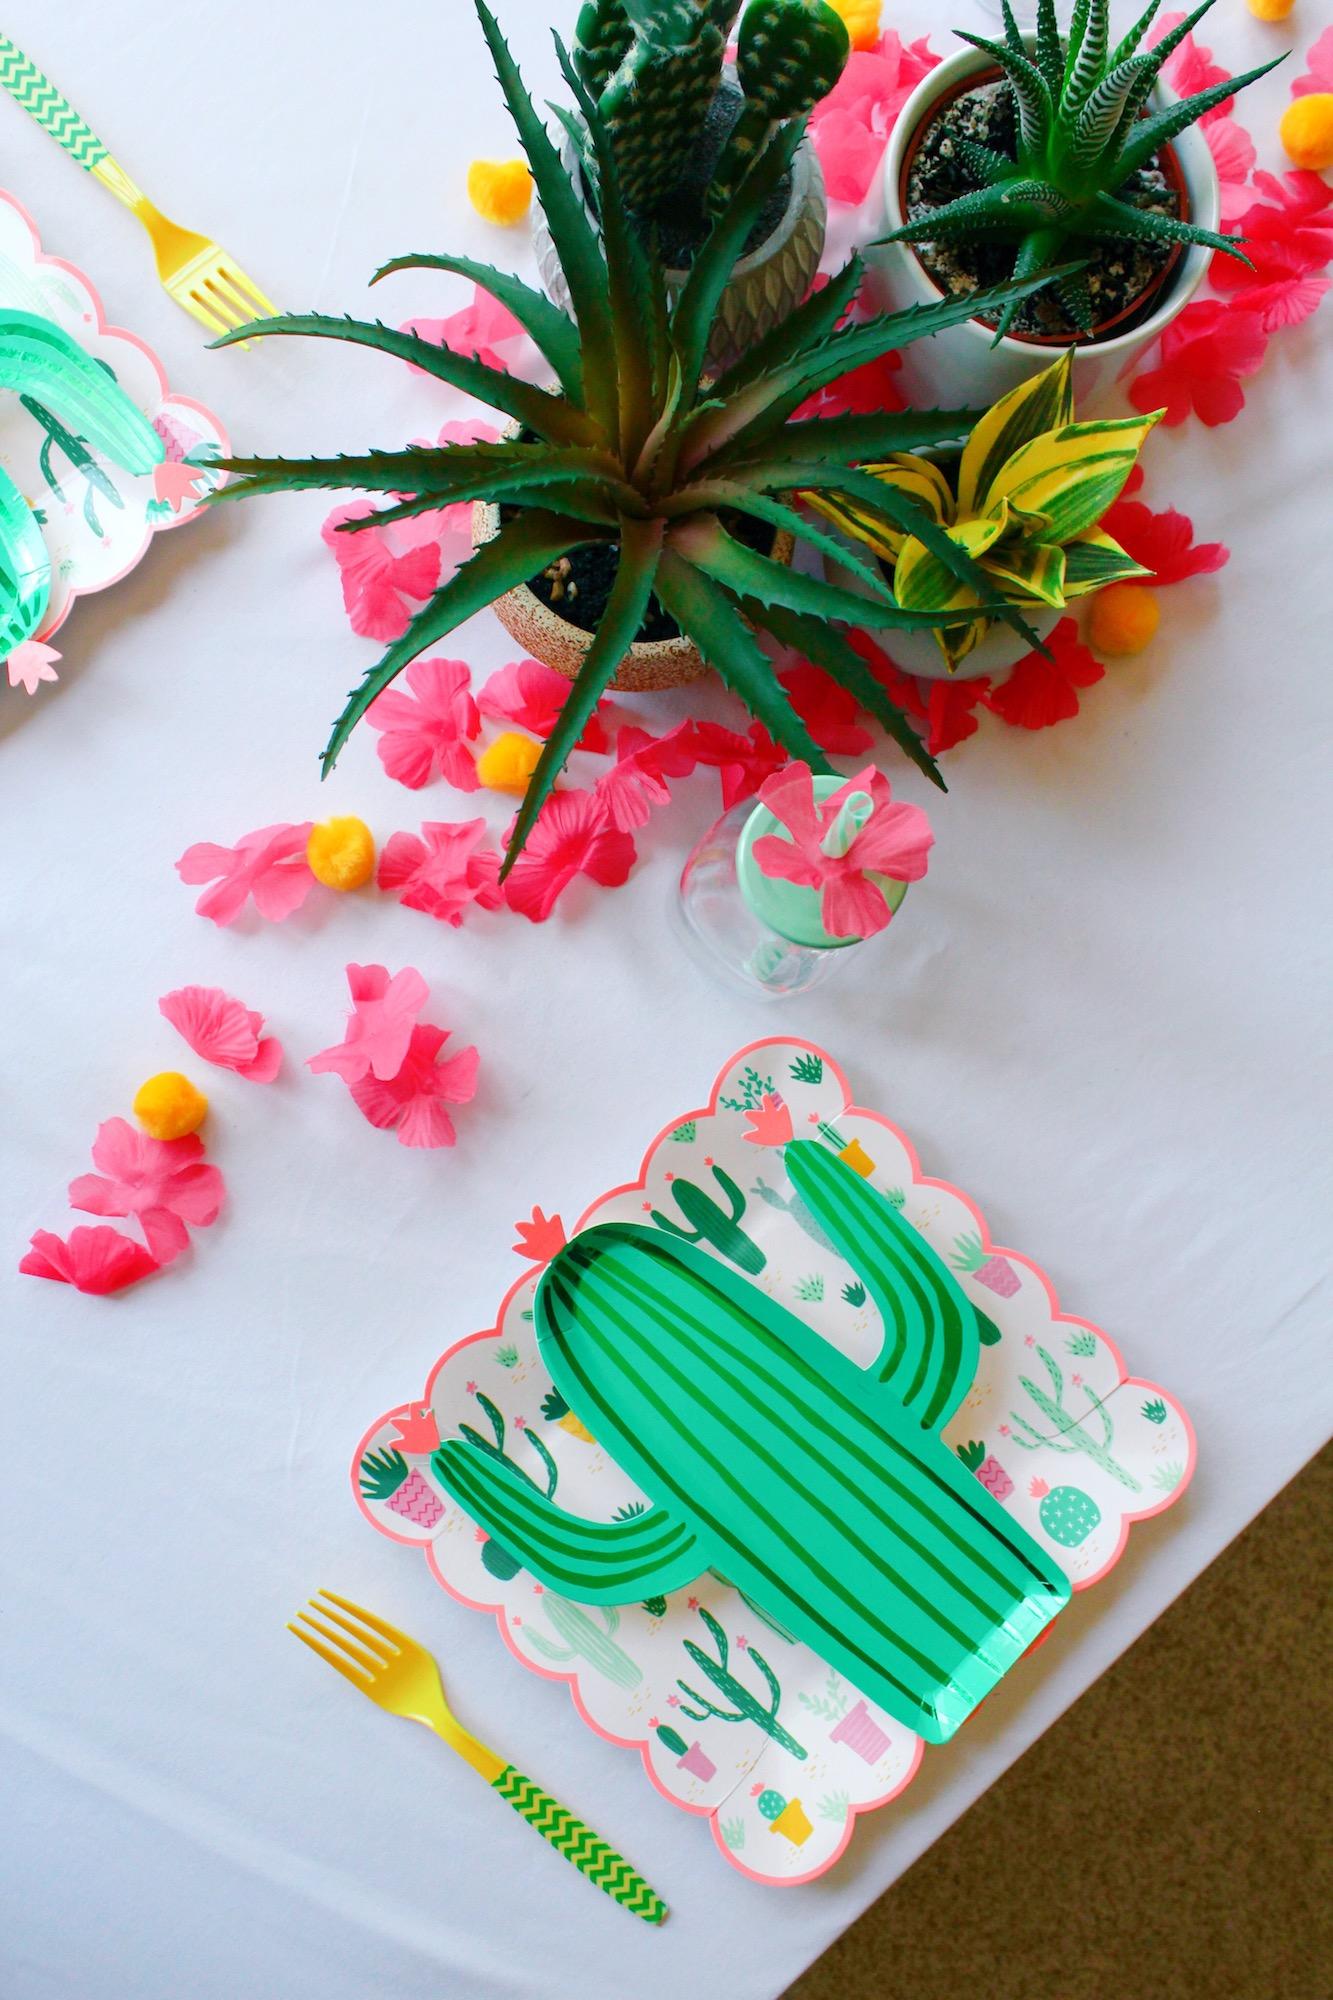 Cactus Party Plates_Meri Meri_Table Decor_Design Organize Party.JPG